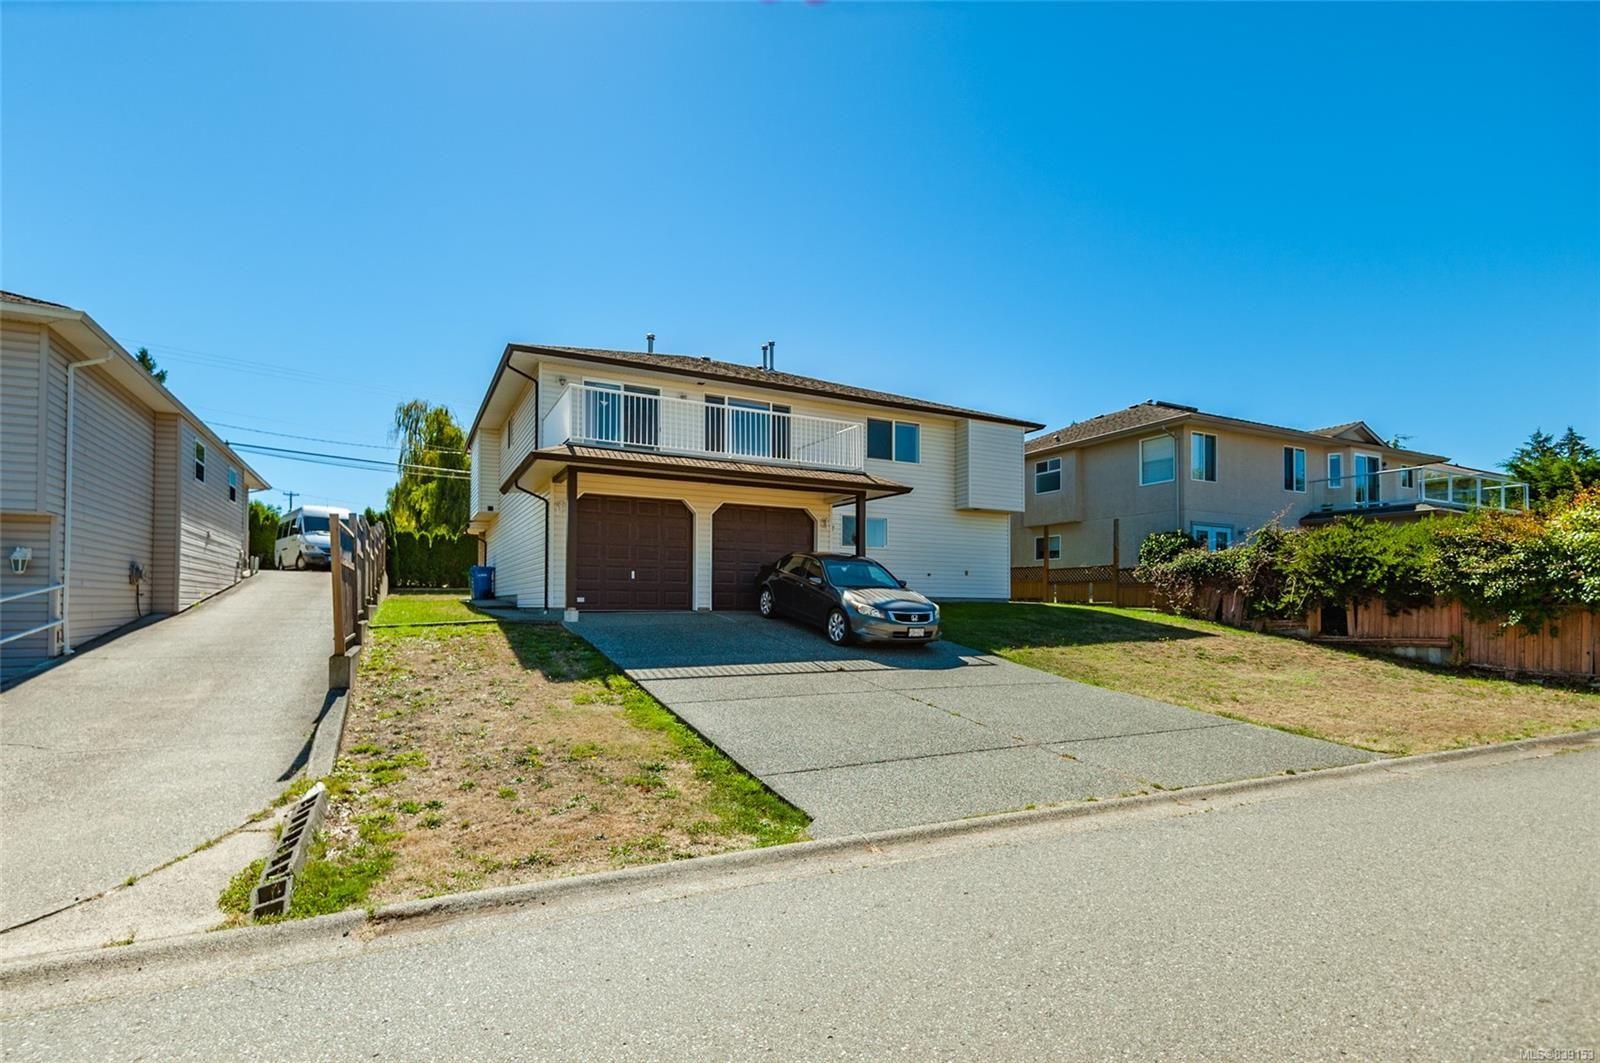 Photo 27: Photos: 6412 Dover Rd in NANAIMO: Na North Nanaimo House for sale (Nanaimo)  : MLS®# 839153